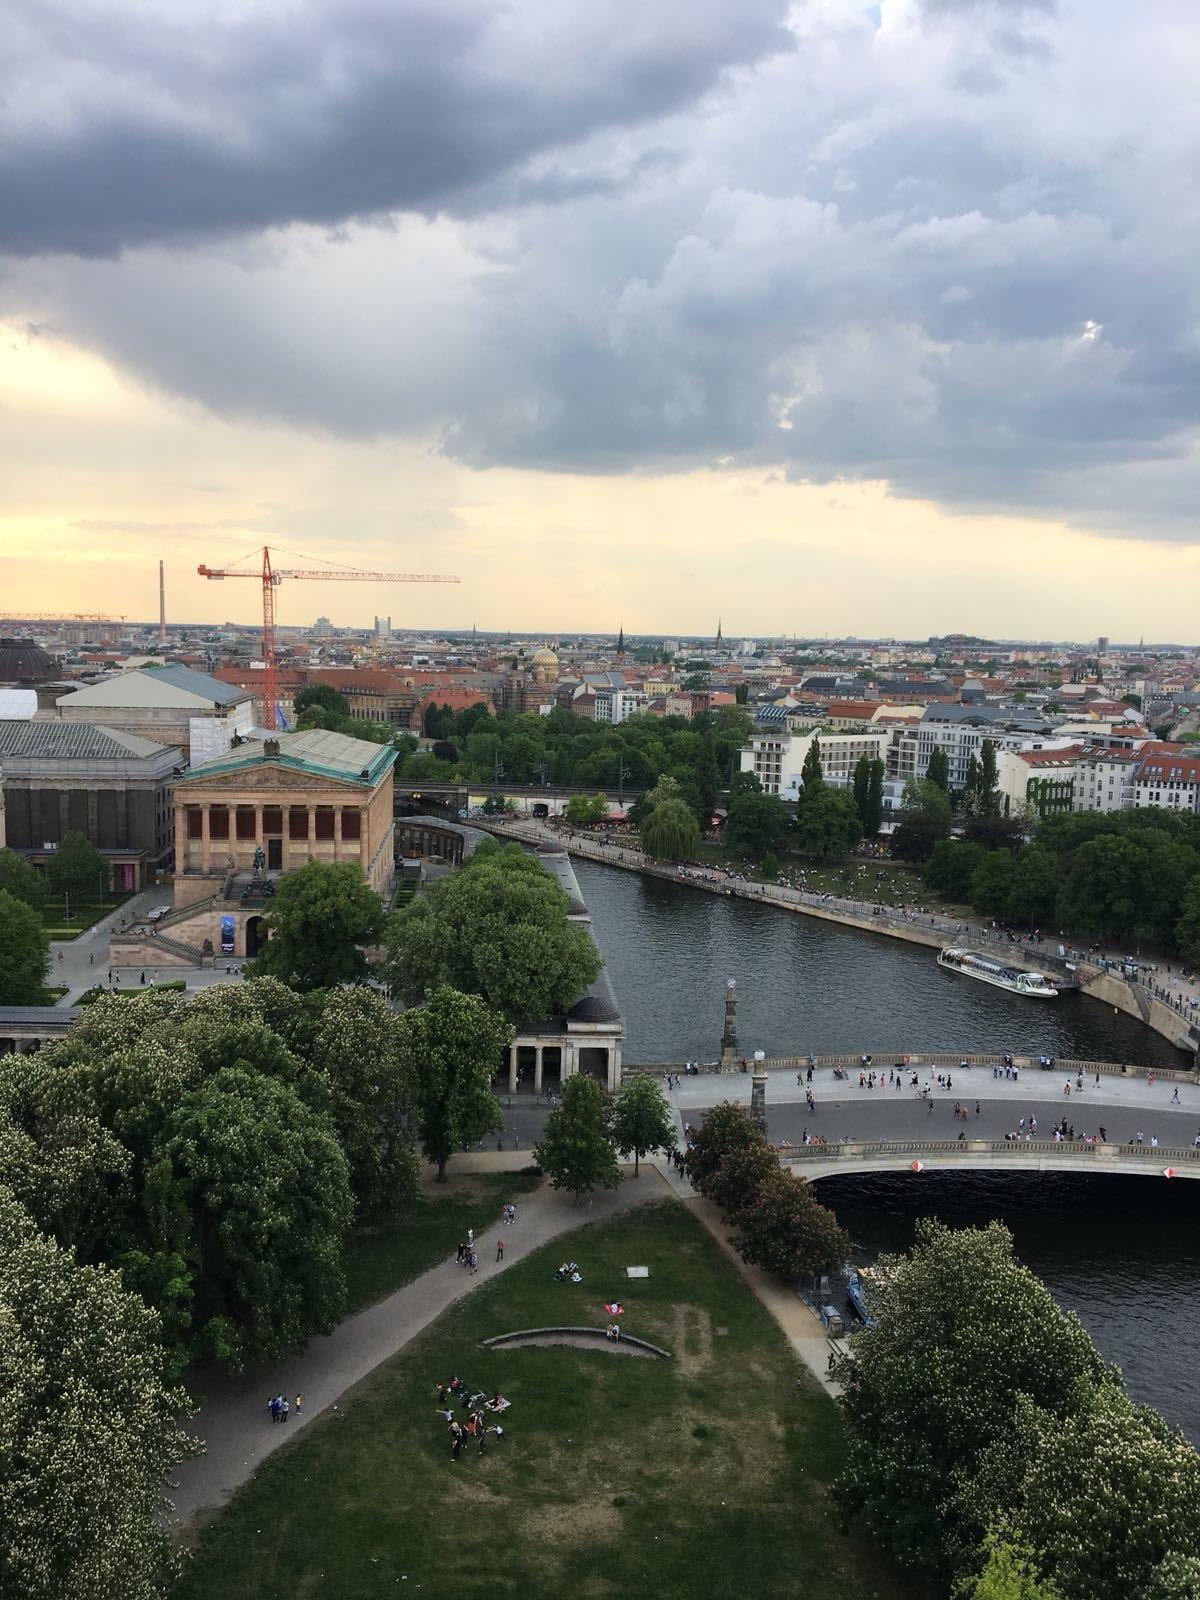 aansluiting cultuur Duitsland Atlanta gratis dating service